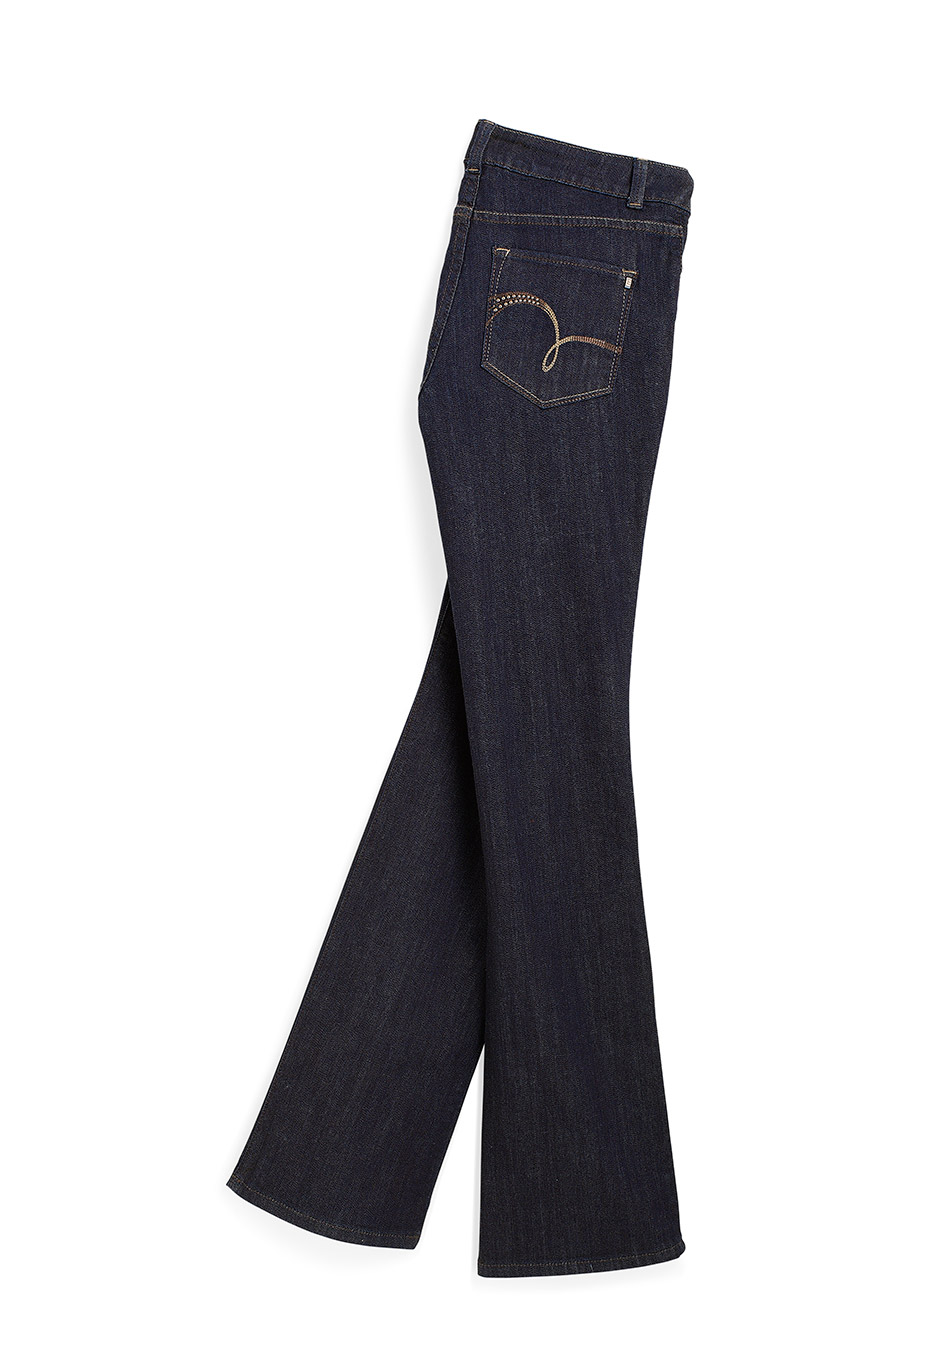 Modern Series Curvy Fit Trouser Jean – цельнокроенные попа и бедра, запоминающая форму ткань